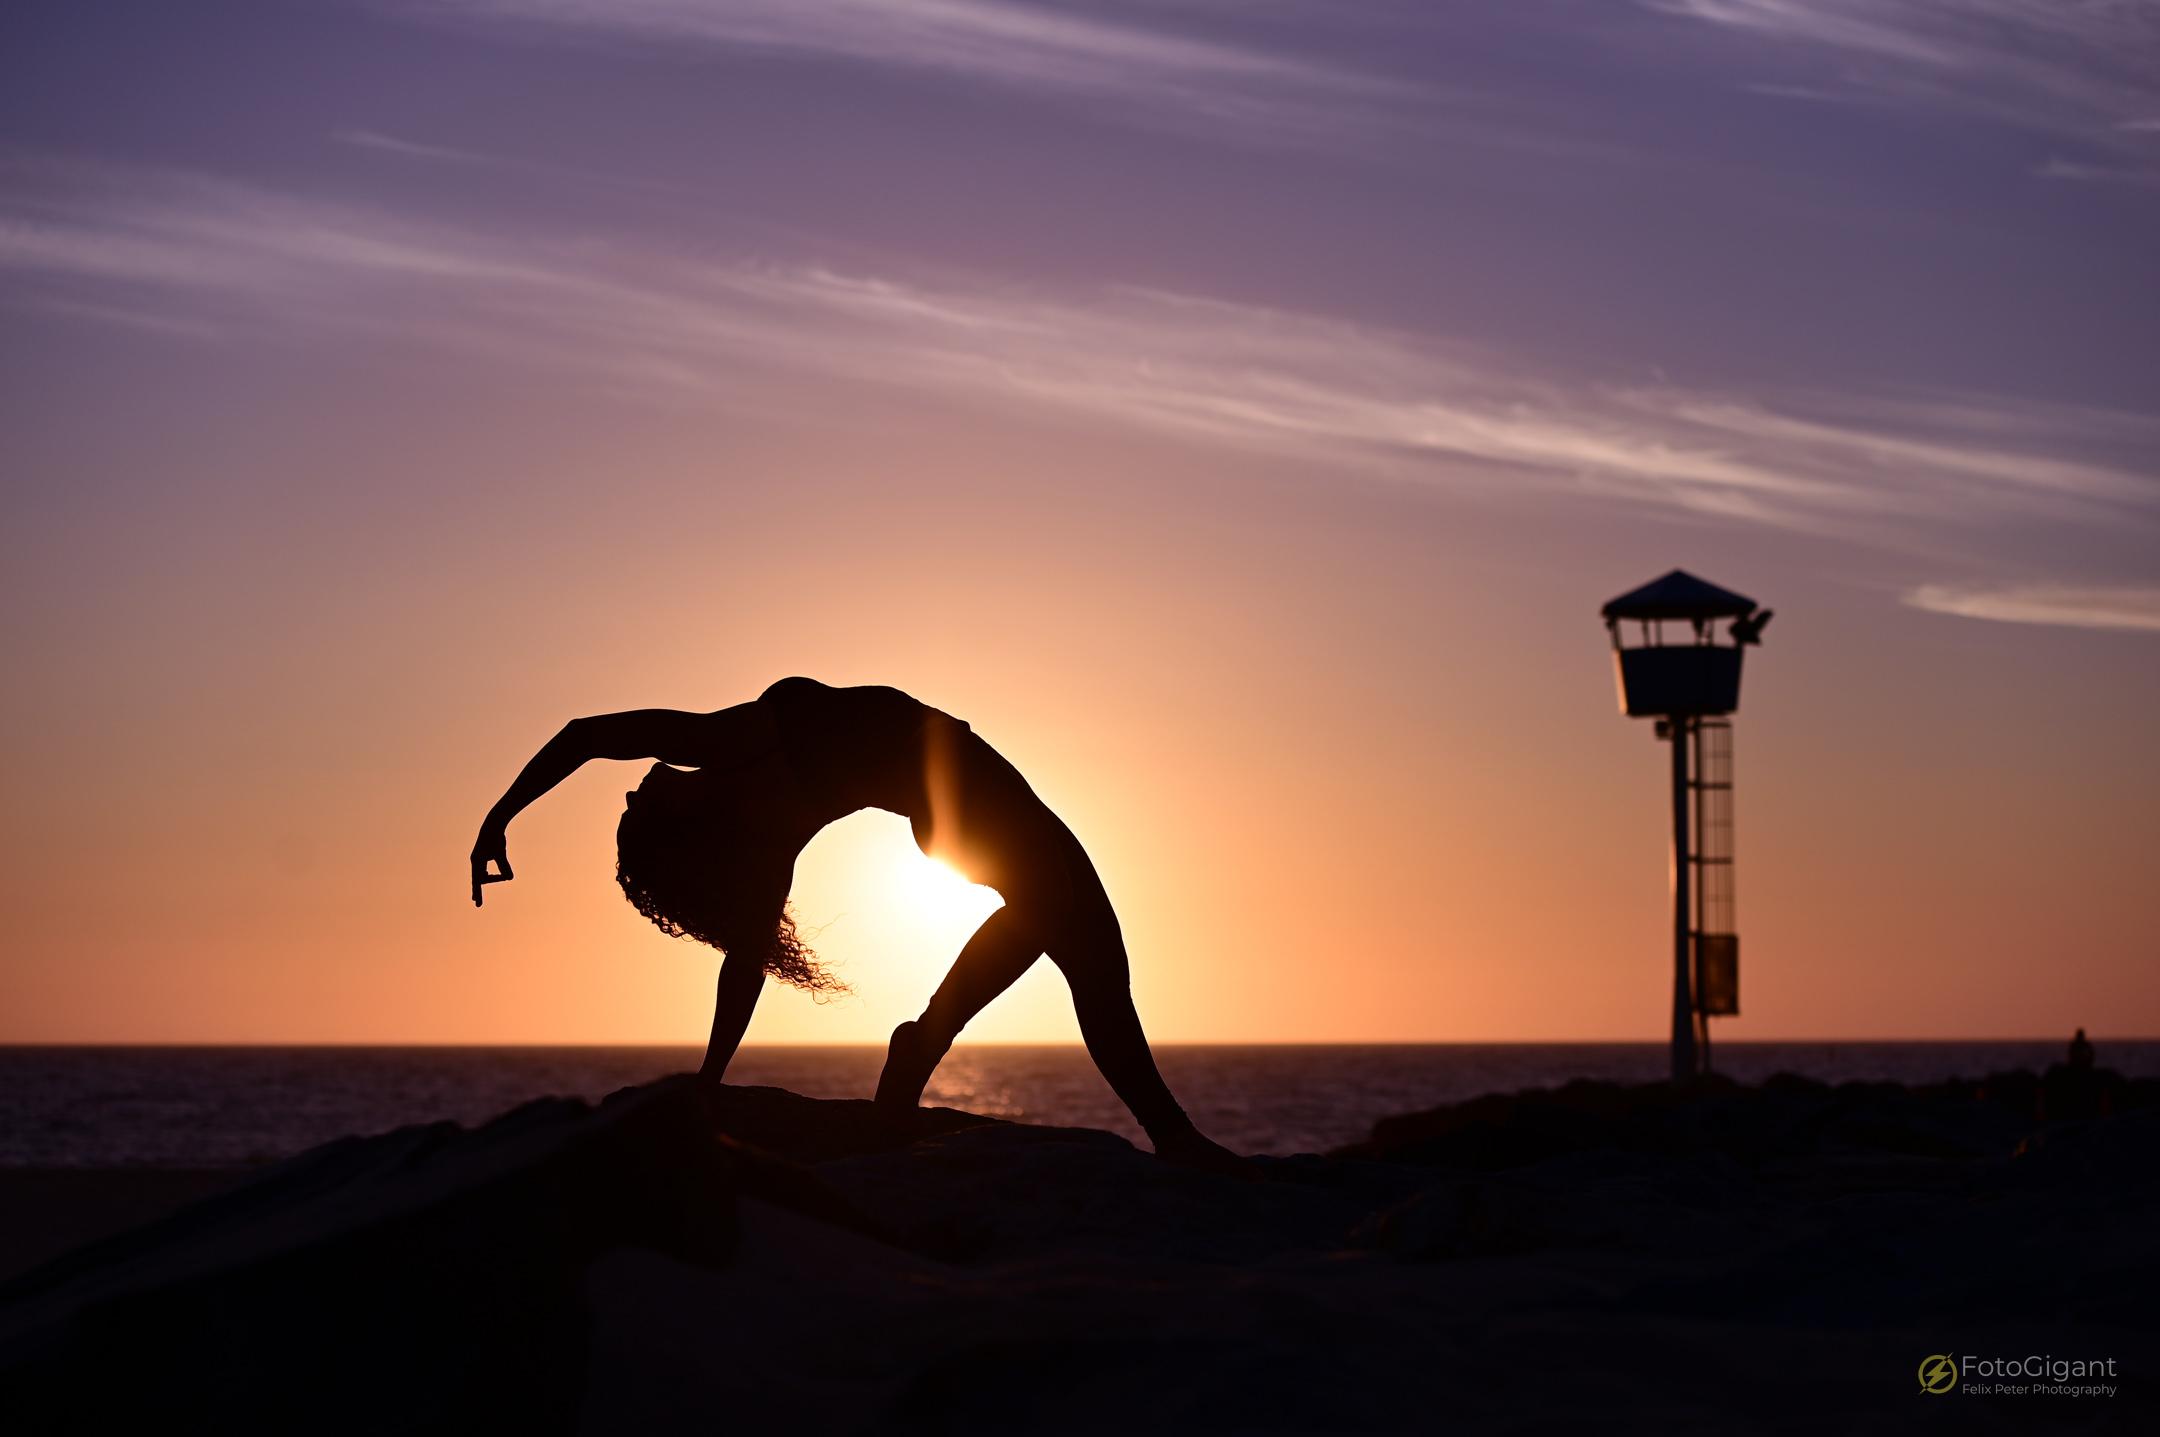 Pilates_Yoga_Silhouettes_04.jpg